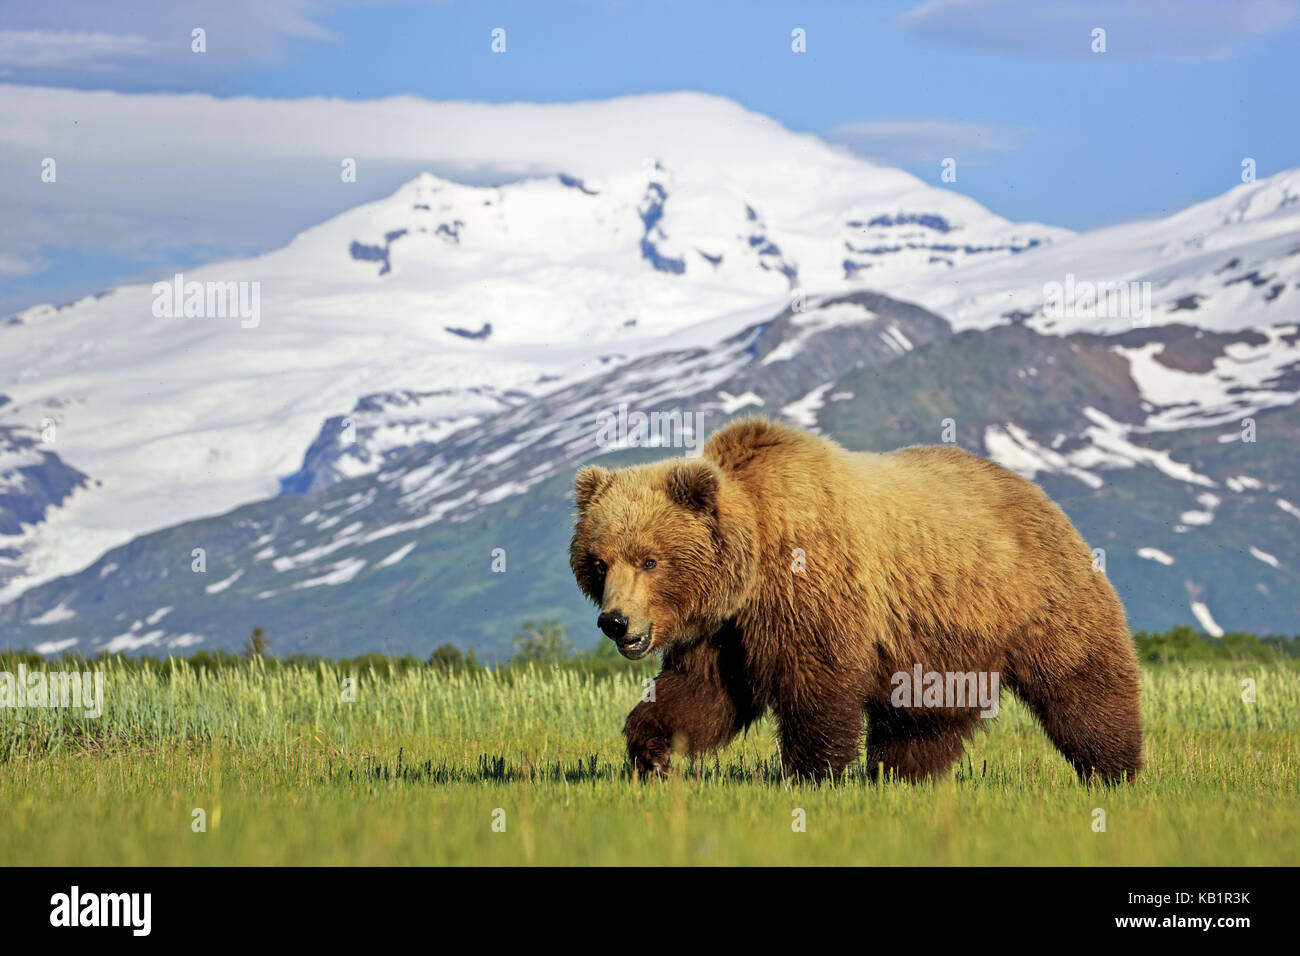 North America, the USA, Alaska, Katmai national park, Hello, Bay, brown bear, Ursus arctos, - Stock Image